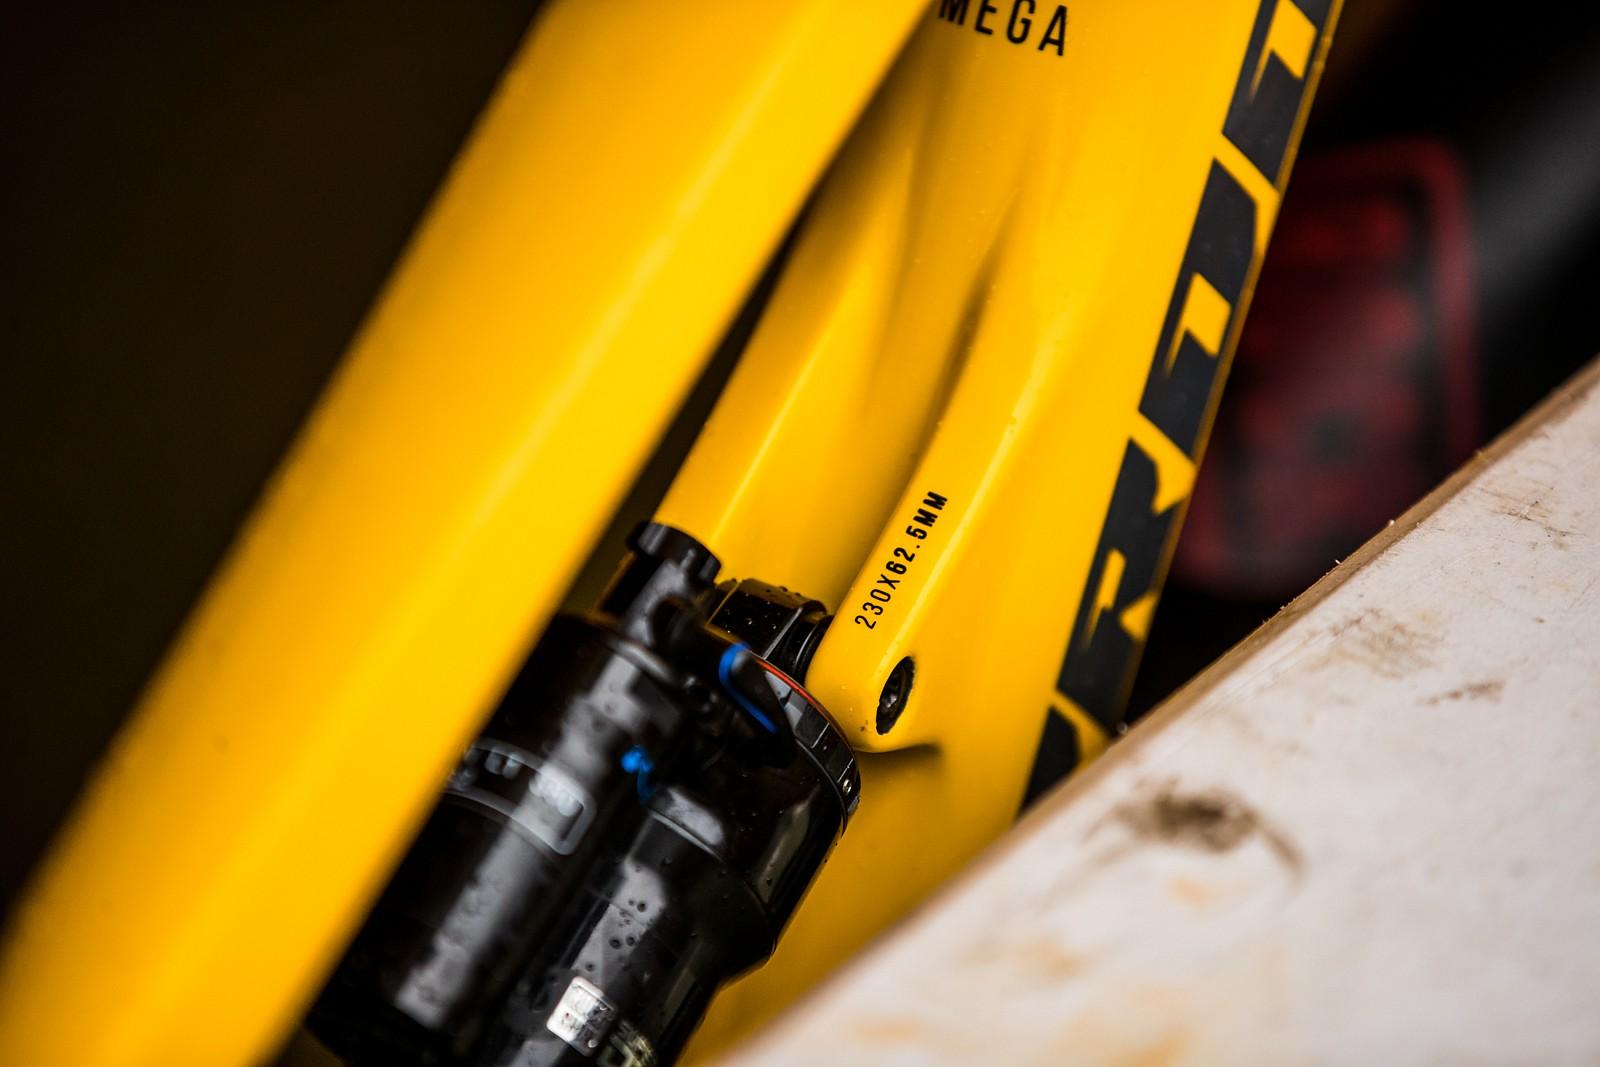 New Nukeproof - PIT BITS - Enduro World Series, Zermatt - Mountain Biking Pictures - Vital MTB